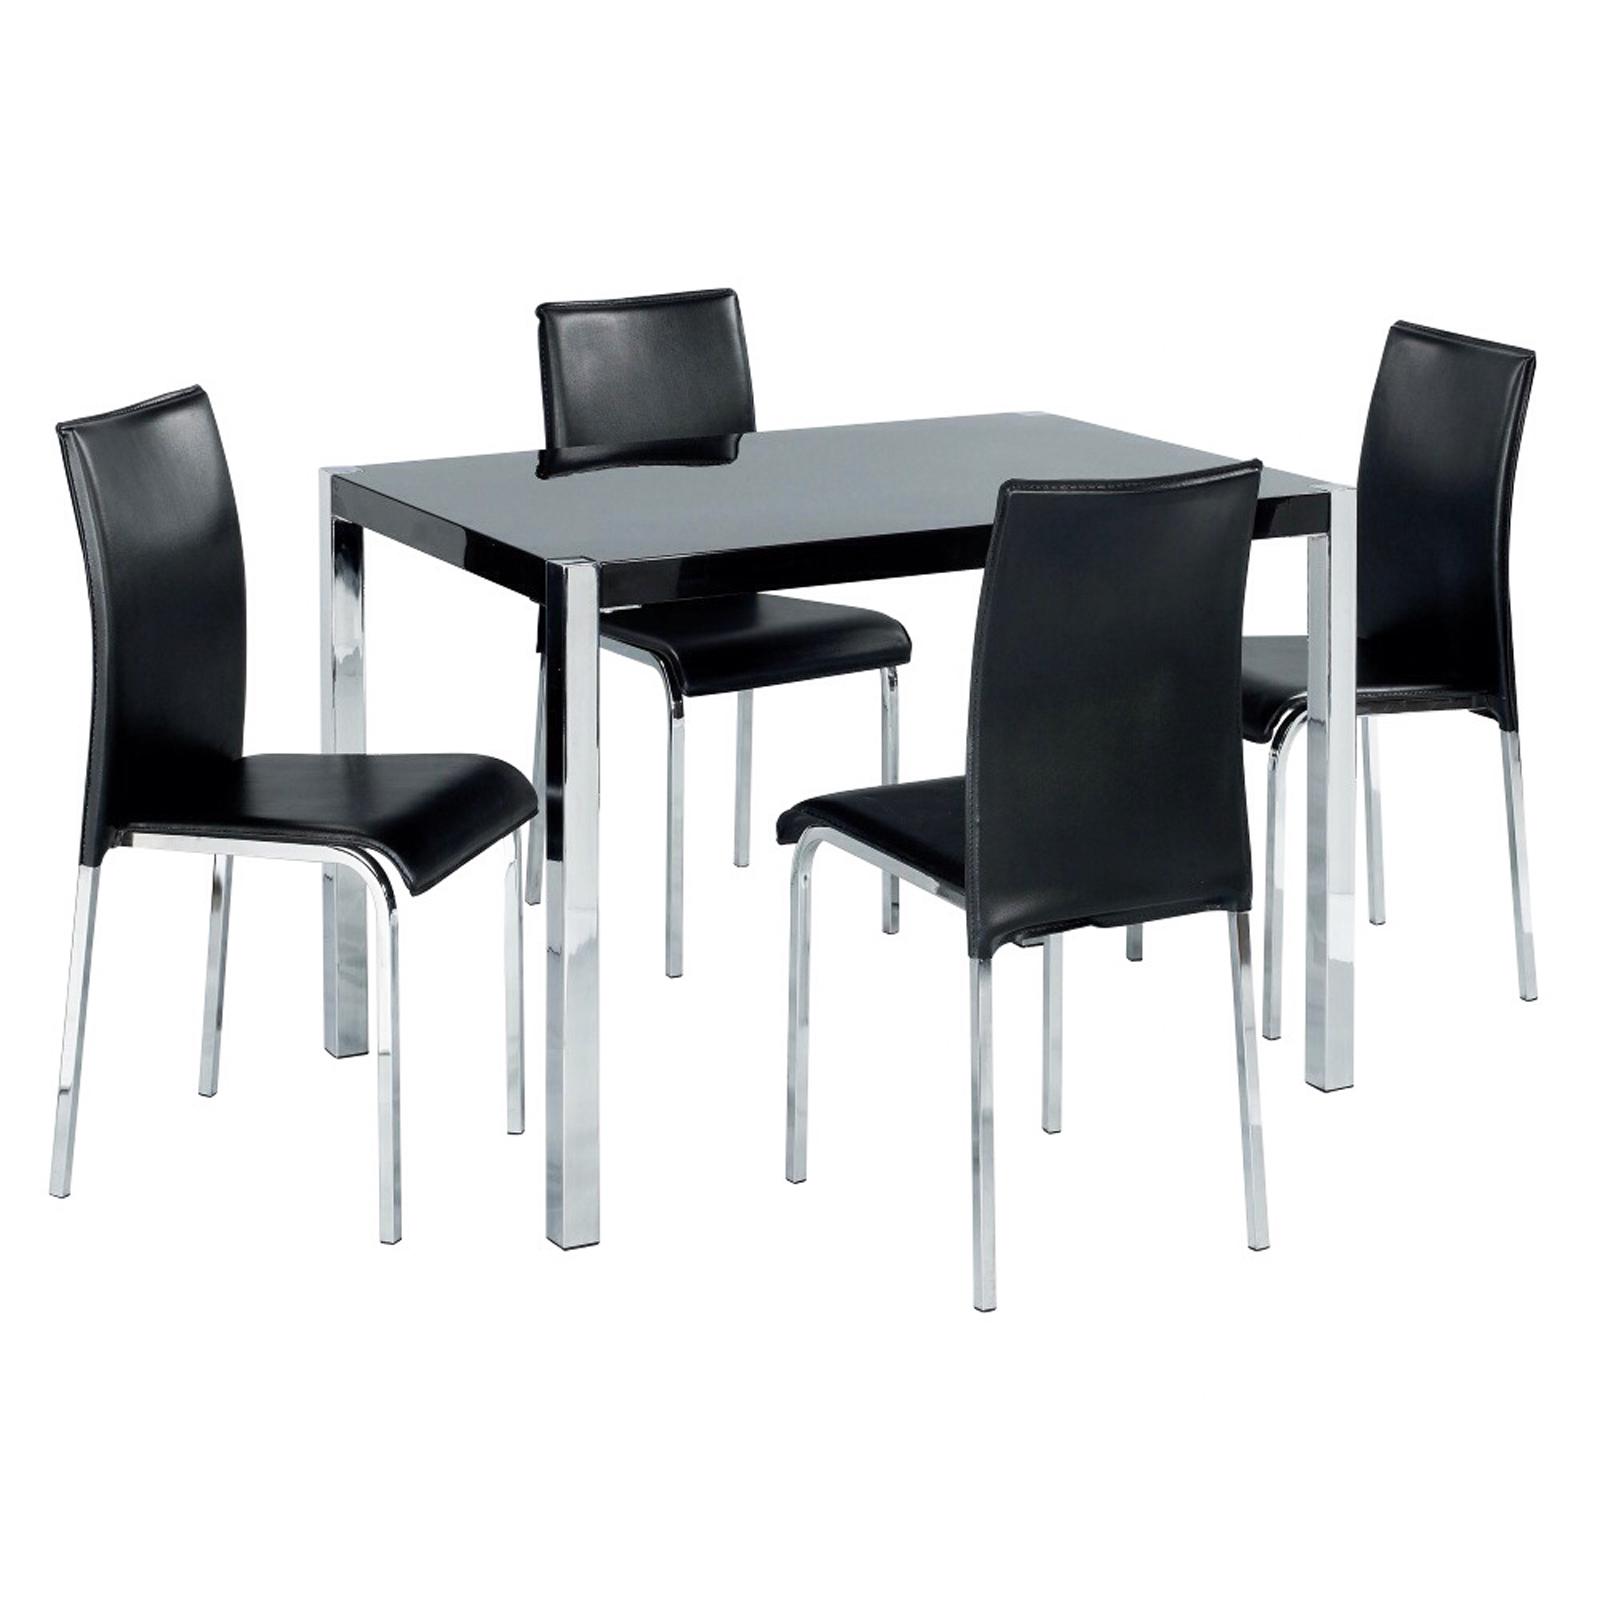 kitchen chairs metal frame photo - 7